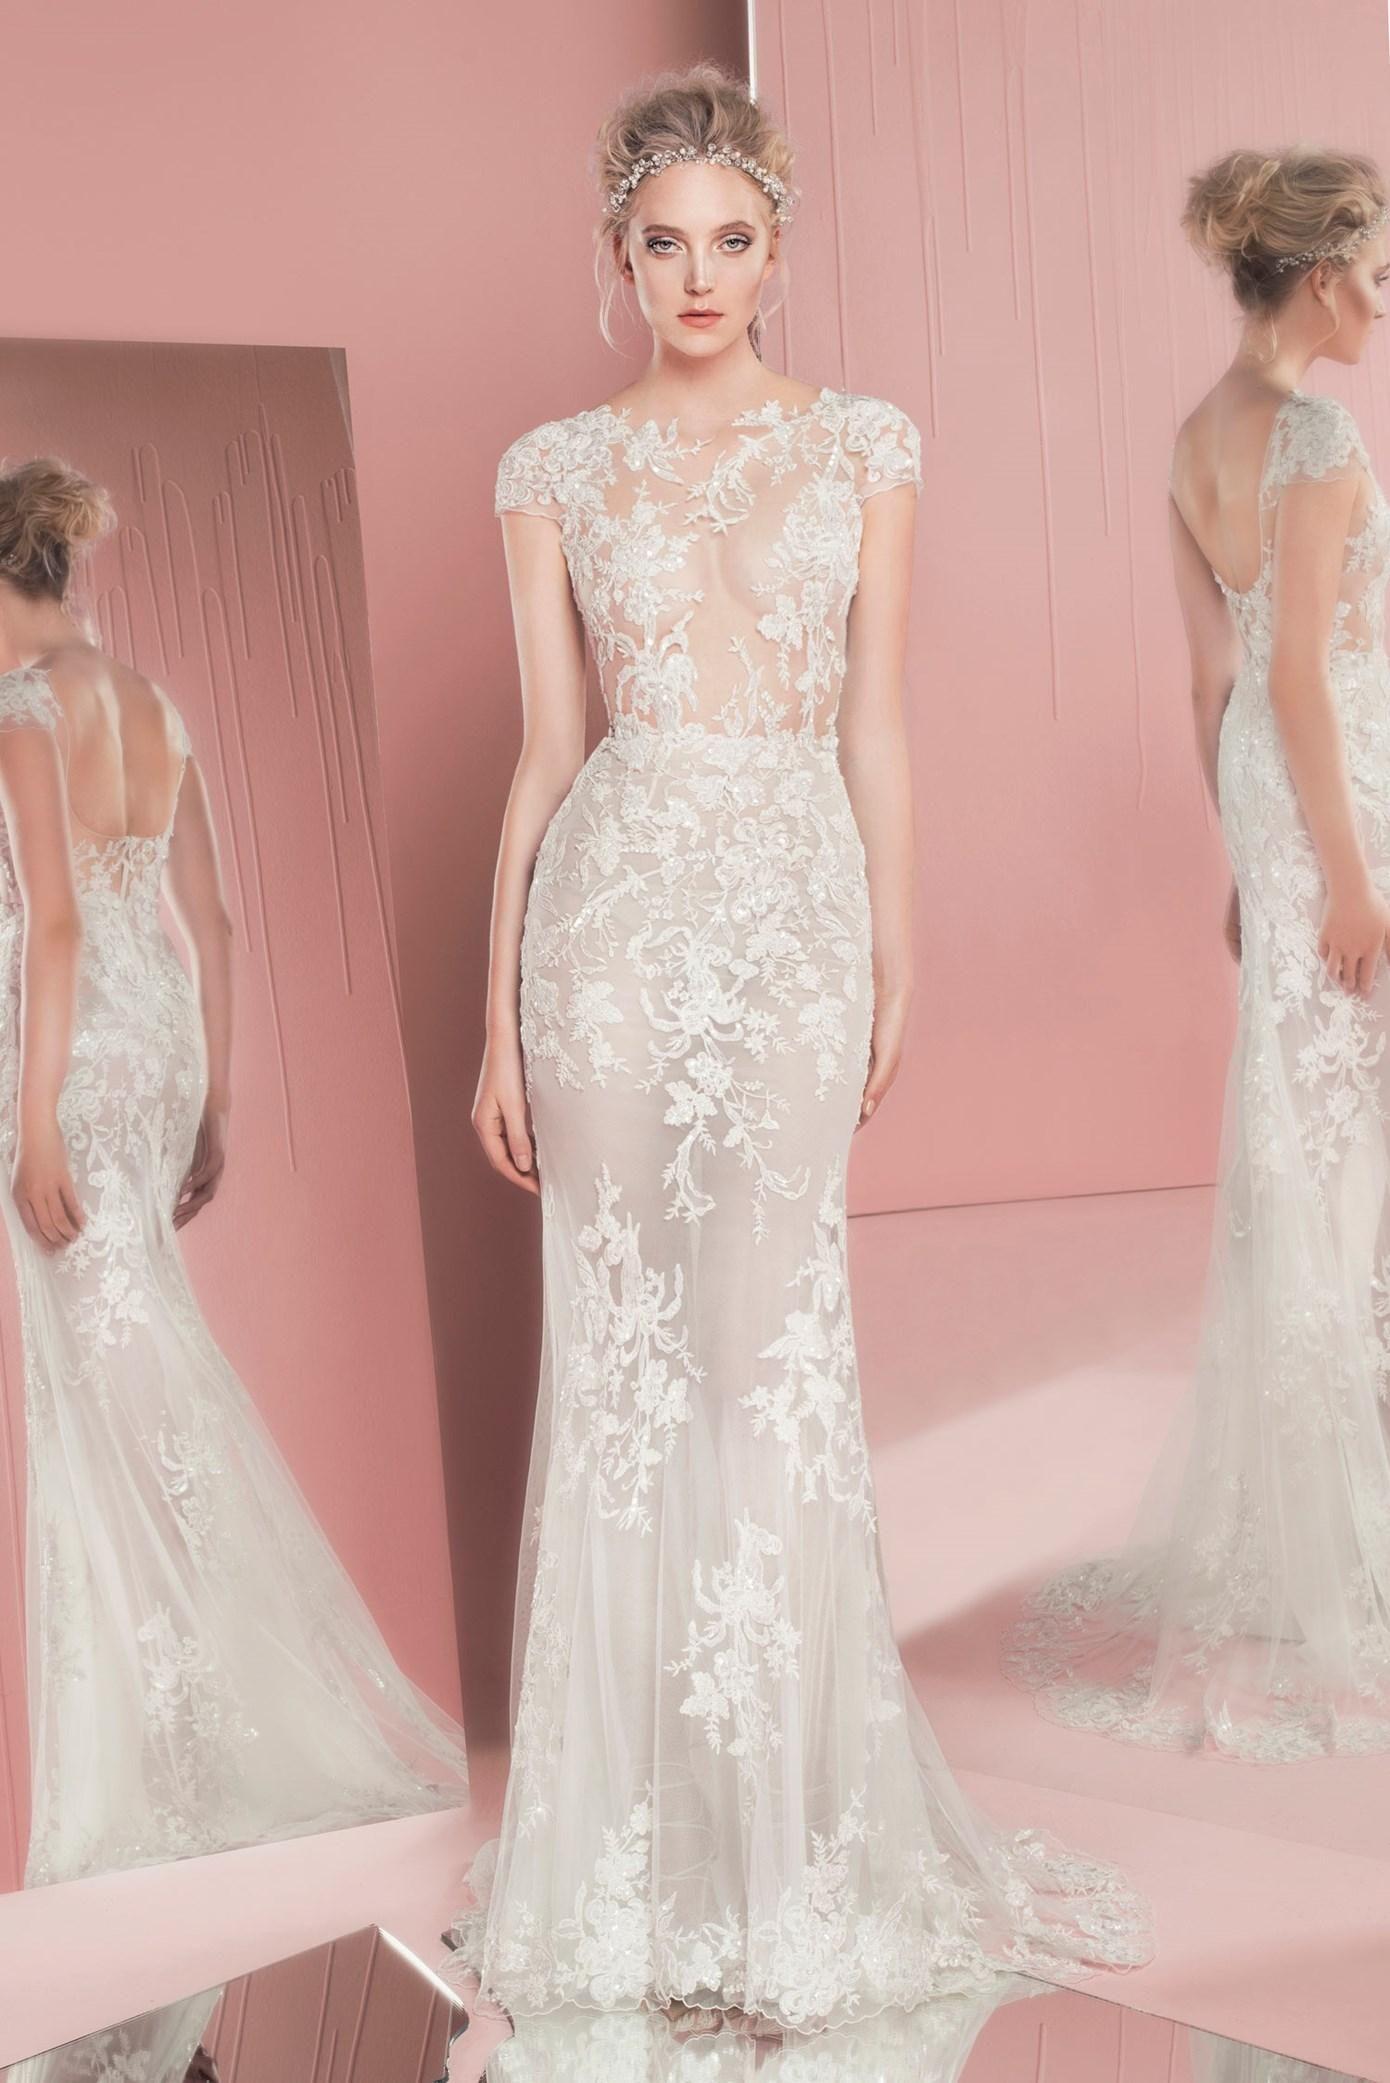 Zuhair Murad Sheath Lace Dresses Wedding Dresses 2016 Jewel Neck ...